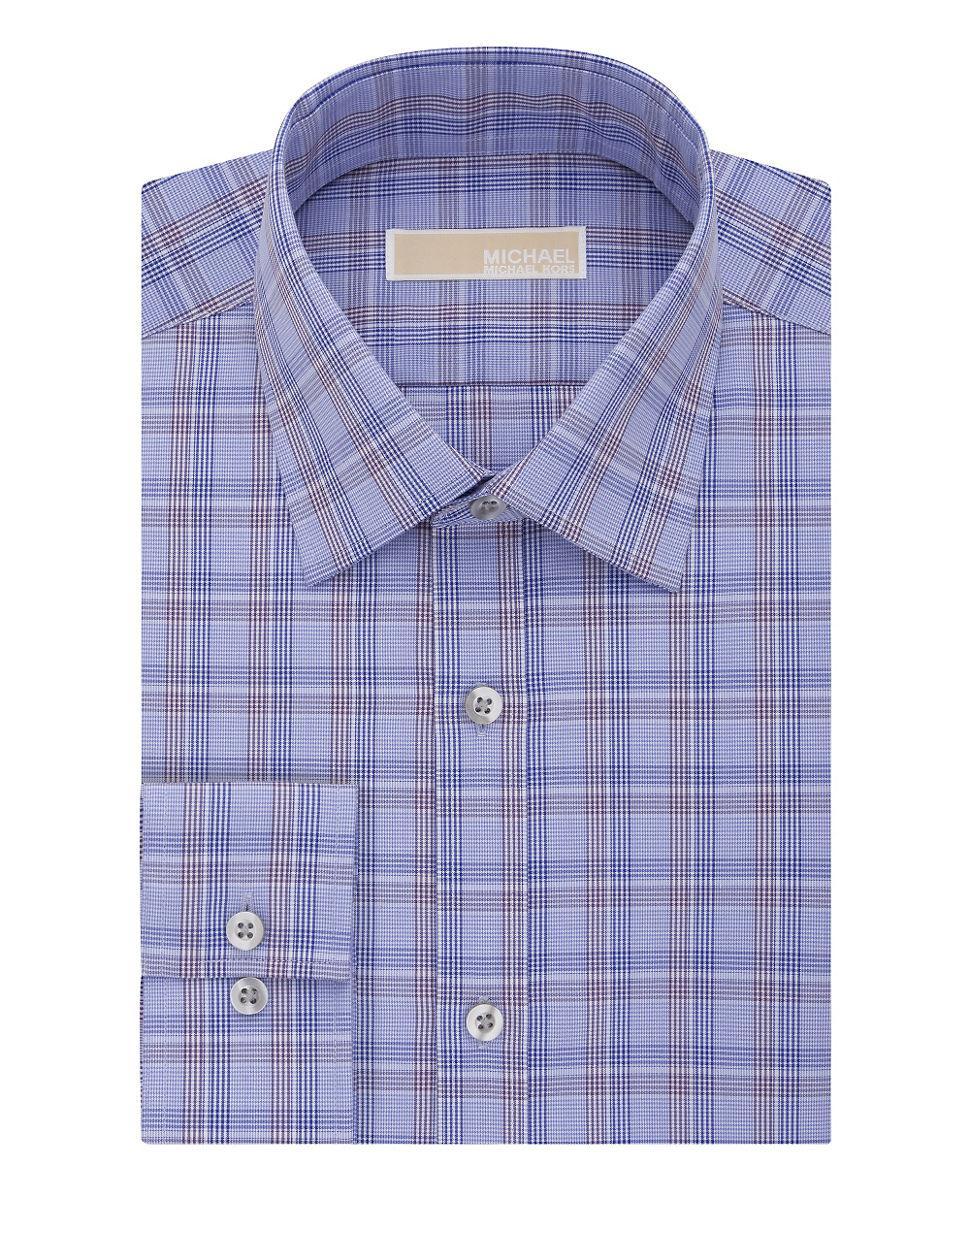 Michael Michael Kors Plaid Dress Shirt In Purple For Men